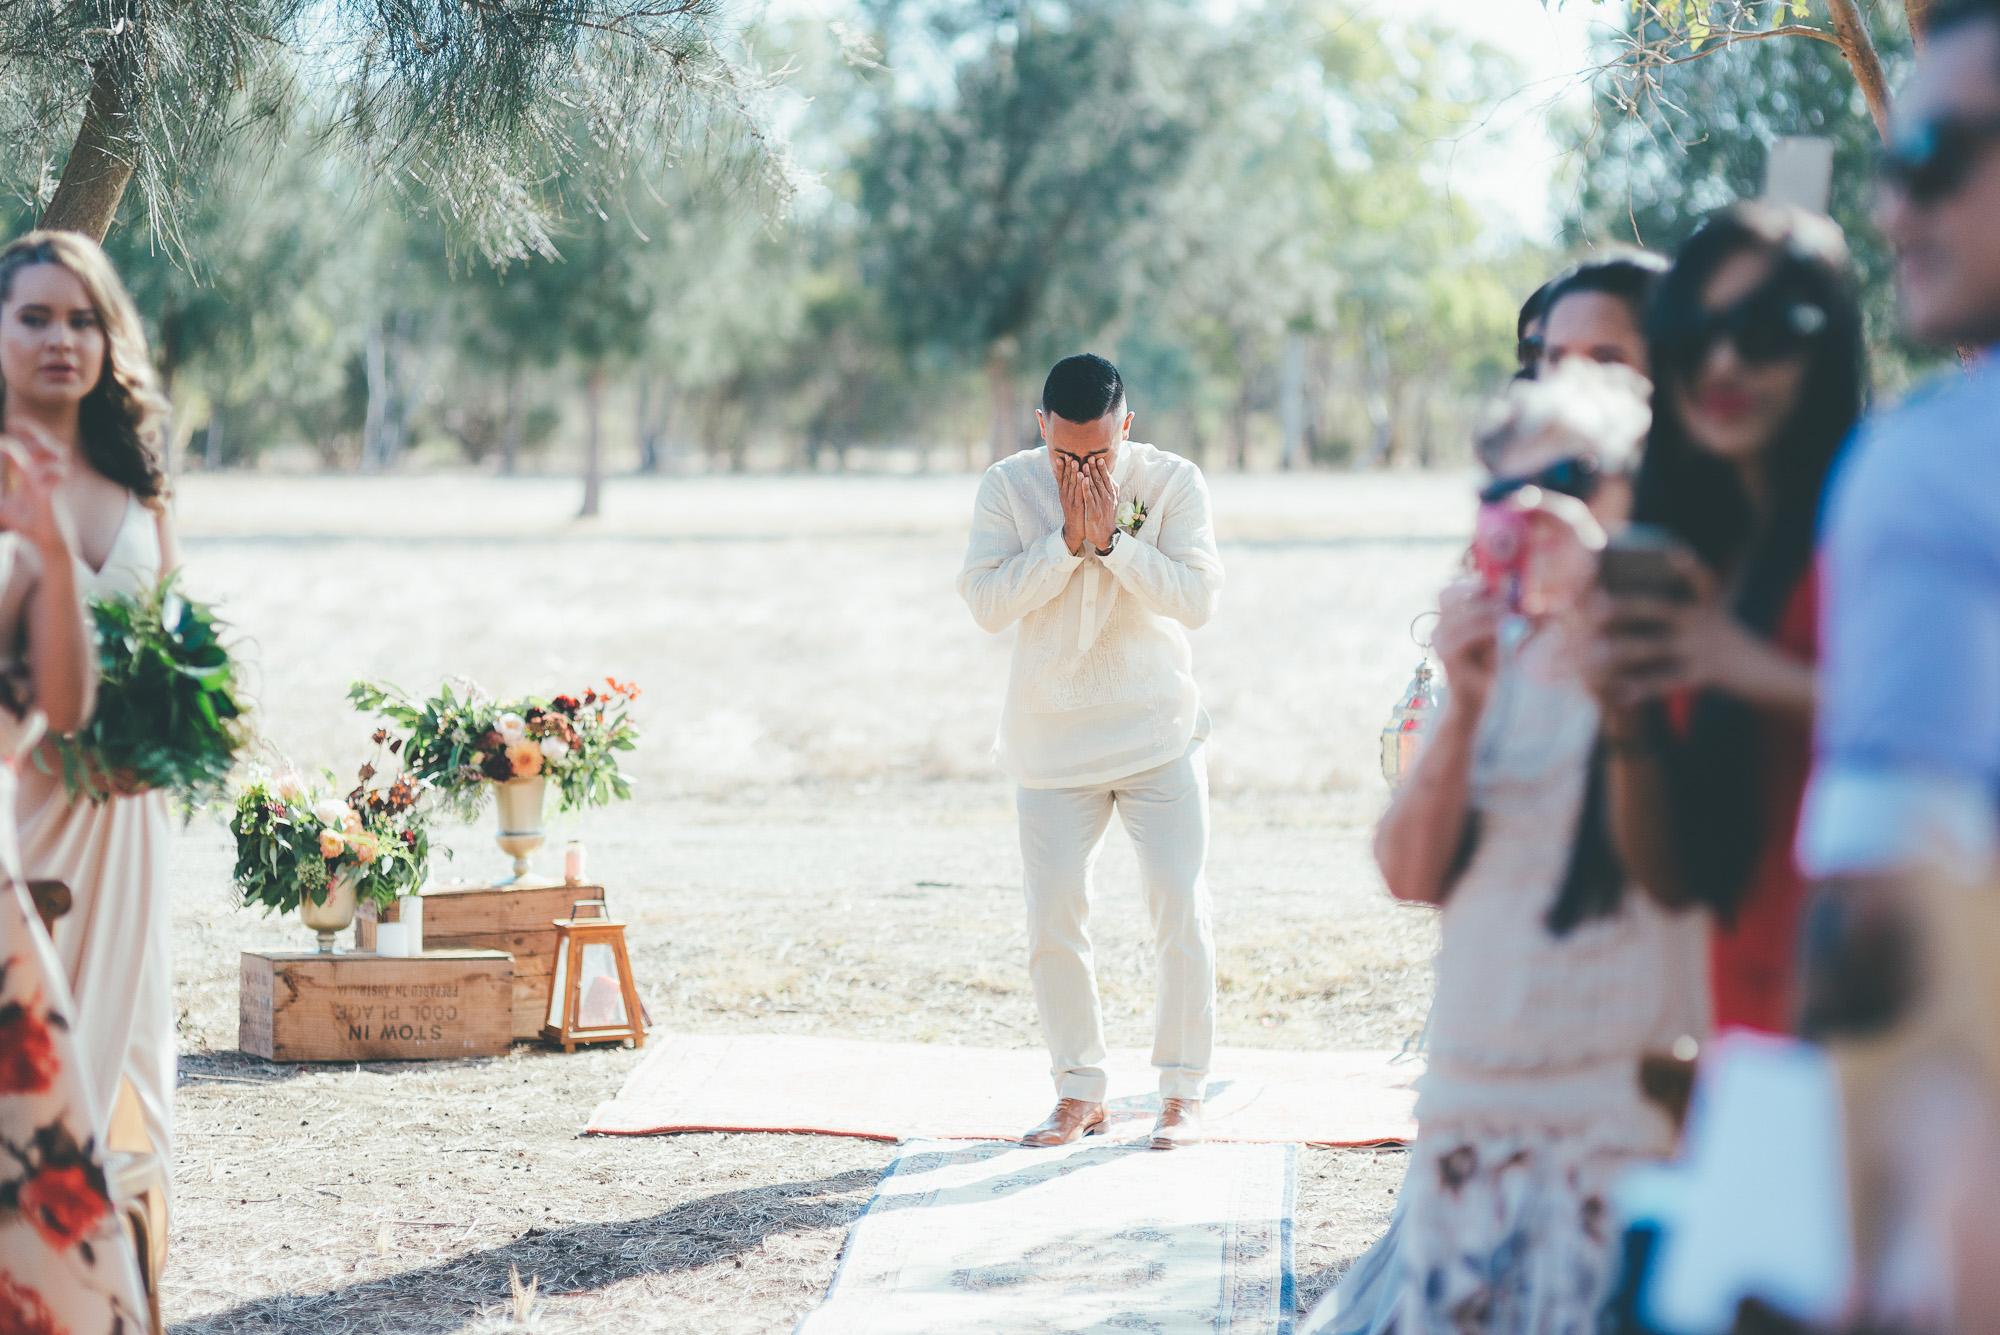 wedding-photographer-outdoor-casual-styled-los-angeles-australia-california-international-earthbound -34.jpg